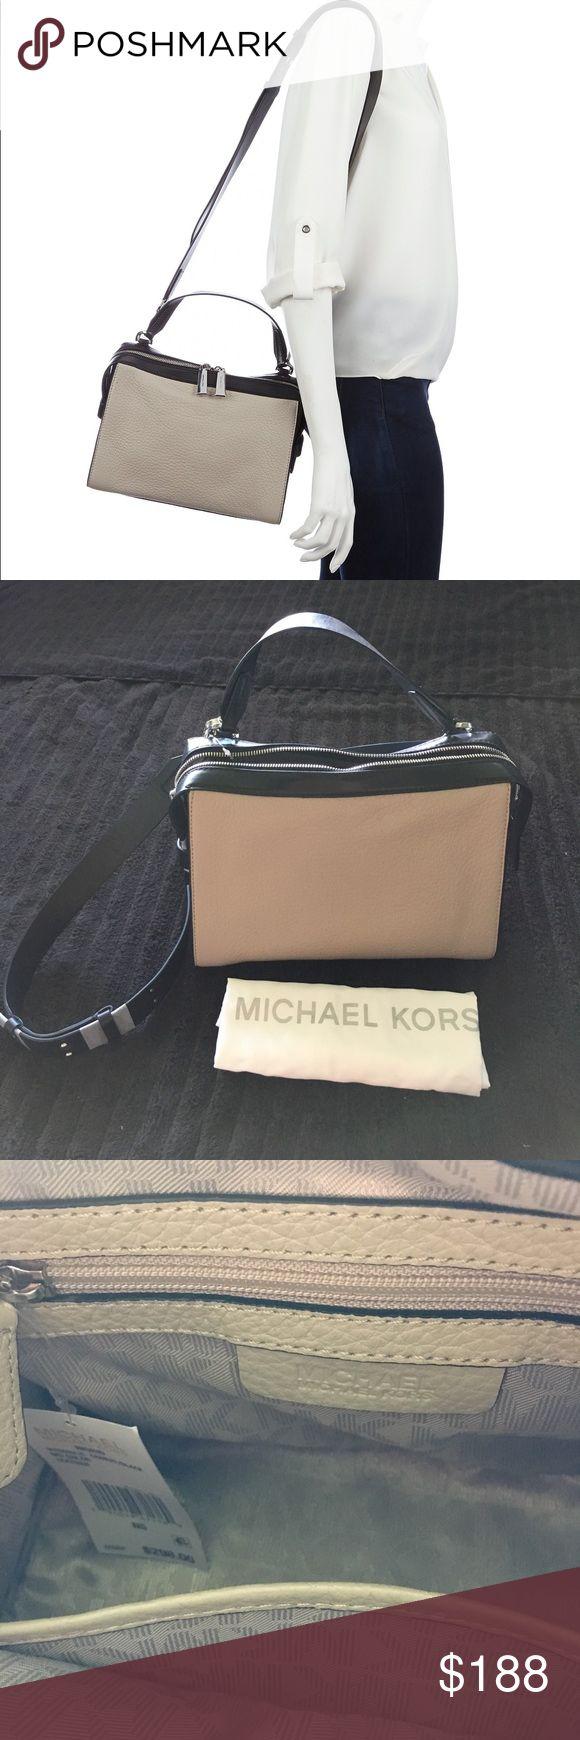 Michael Kors Ingrid Cement Black Bag NWT Michael Kors Ingrid Medium Cement Gray and Black Leather. NWT with dust bag. Authentic. MICHAEL Michael Kors Bags Shoulder Bags